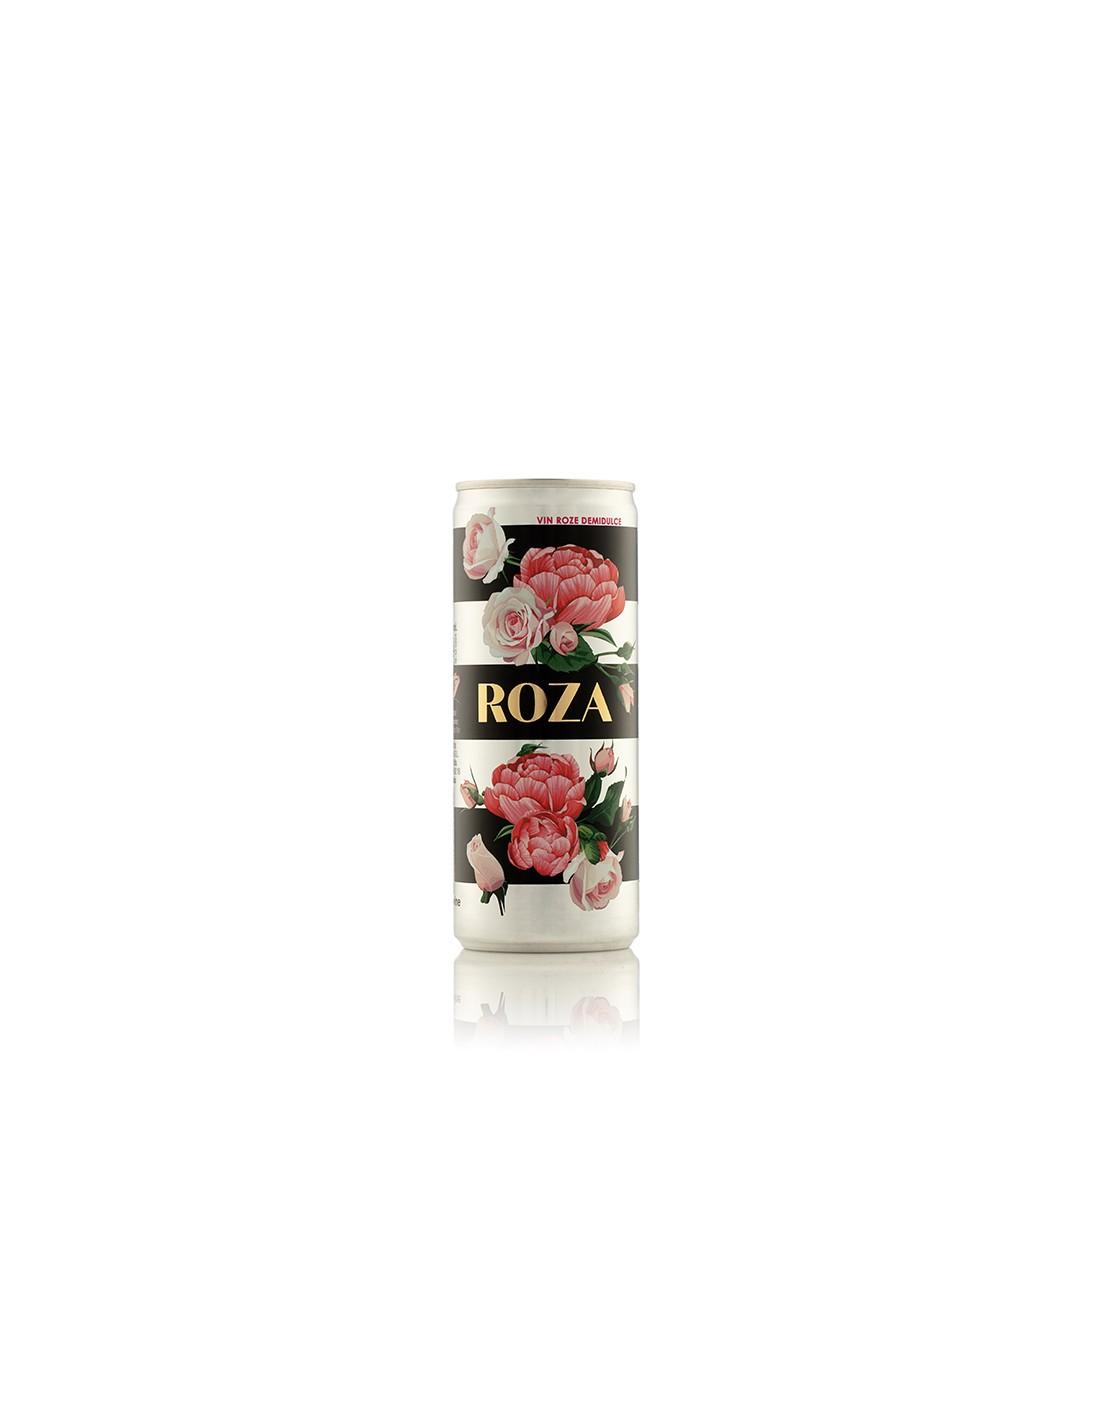 Vin rose demidulce, Feteasca Neagra & Pinot Noir, Roza, Ciumbrud, 12% alc., 0.25L, Romania